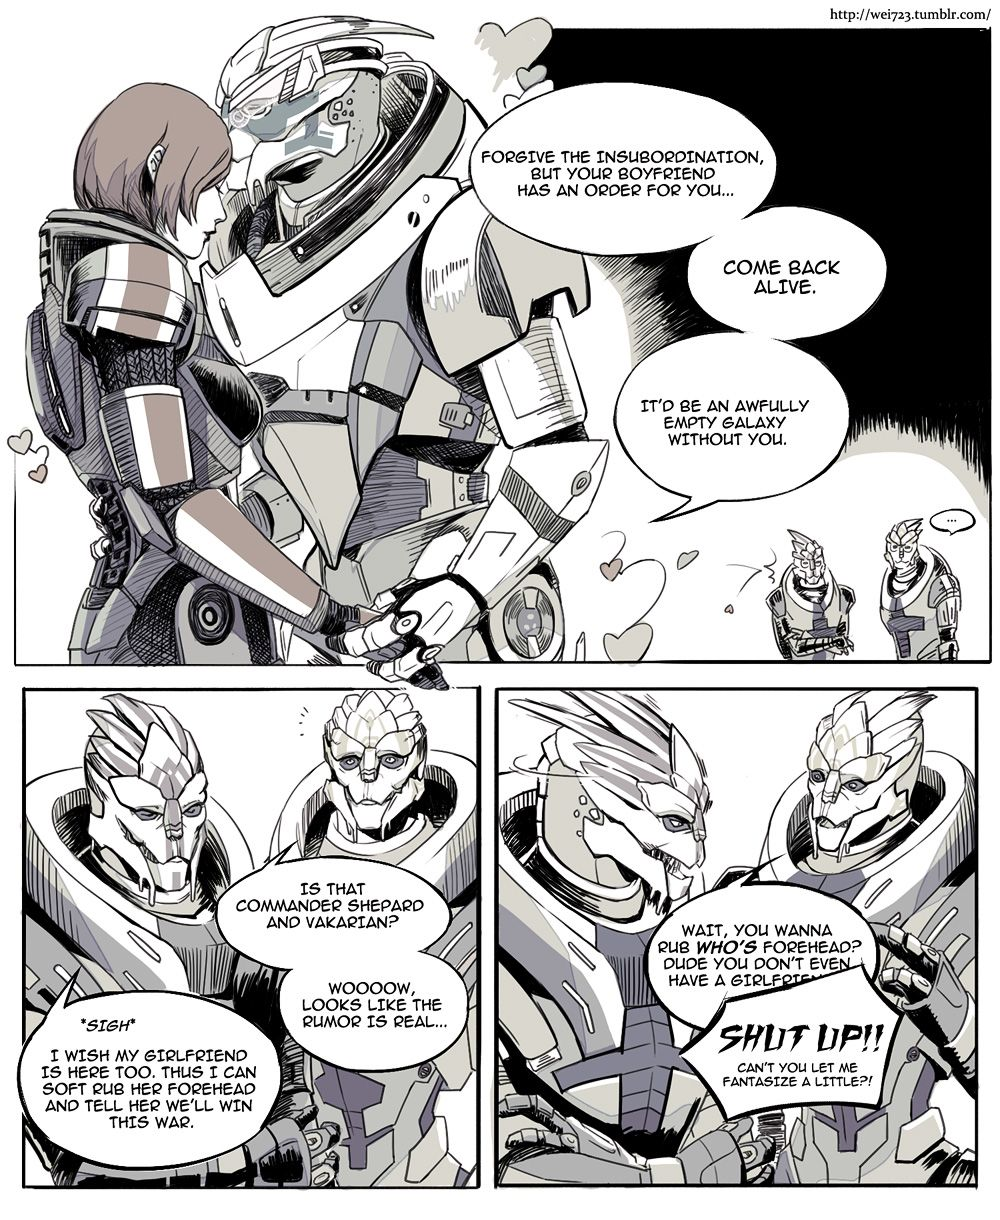 Garrus and Shepard Romance | Video Game stuff | Mass effect